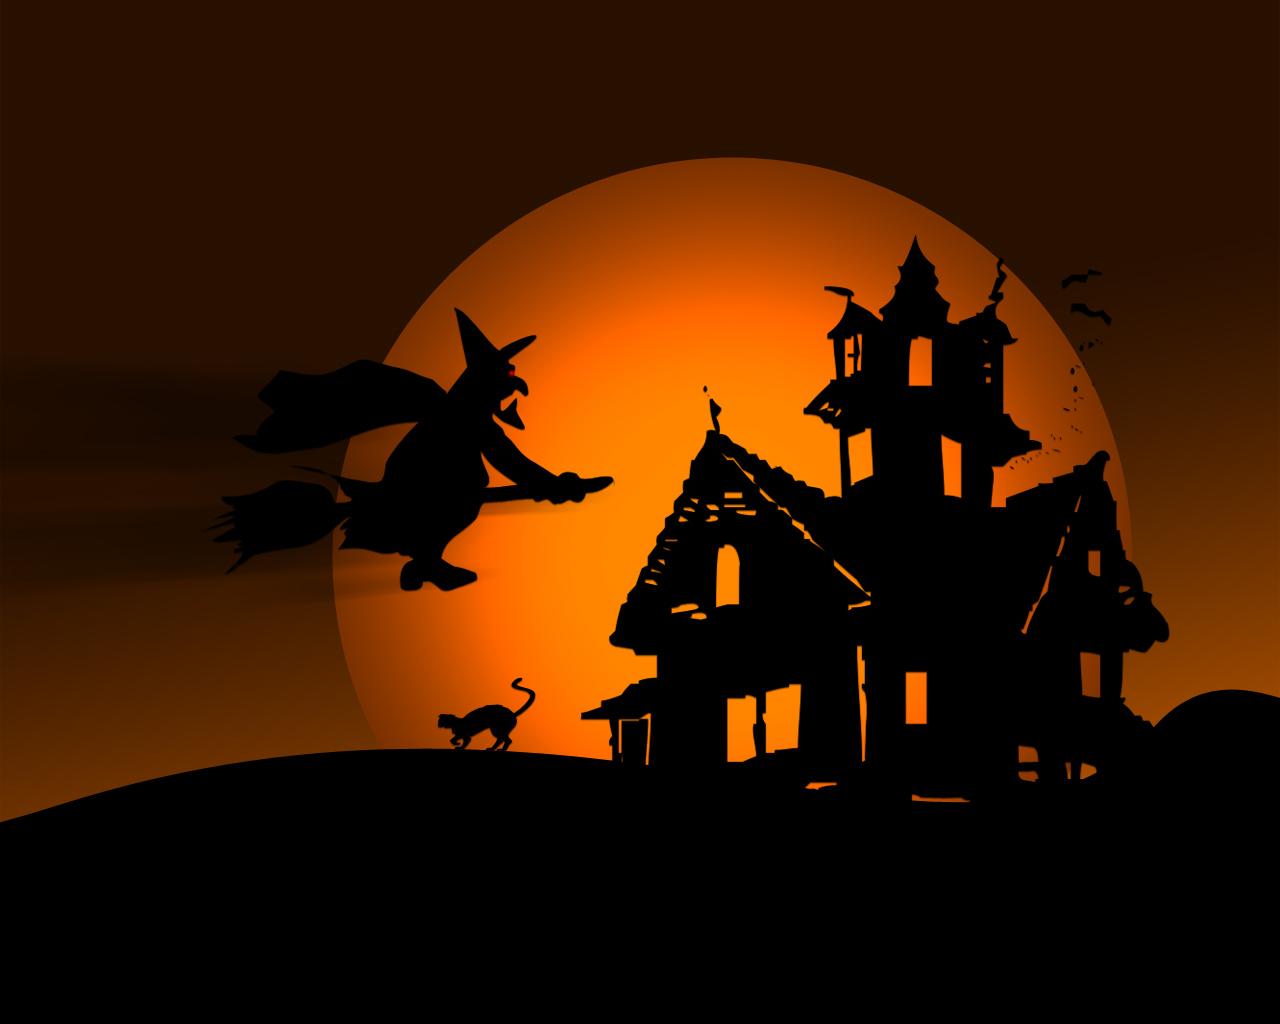 halloween wallpapers free - photo #2